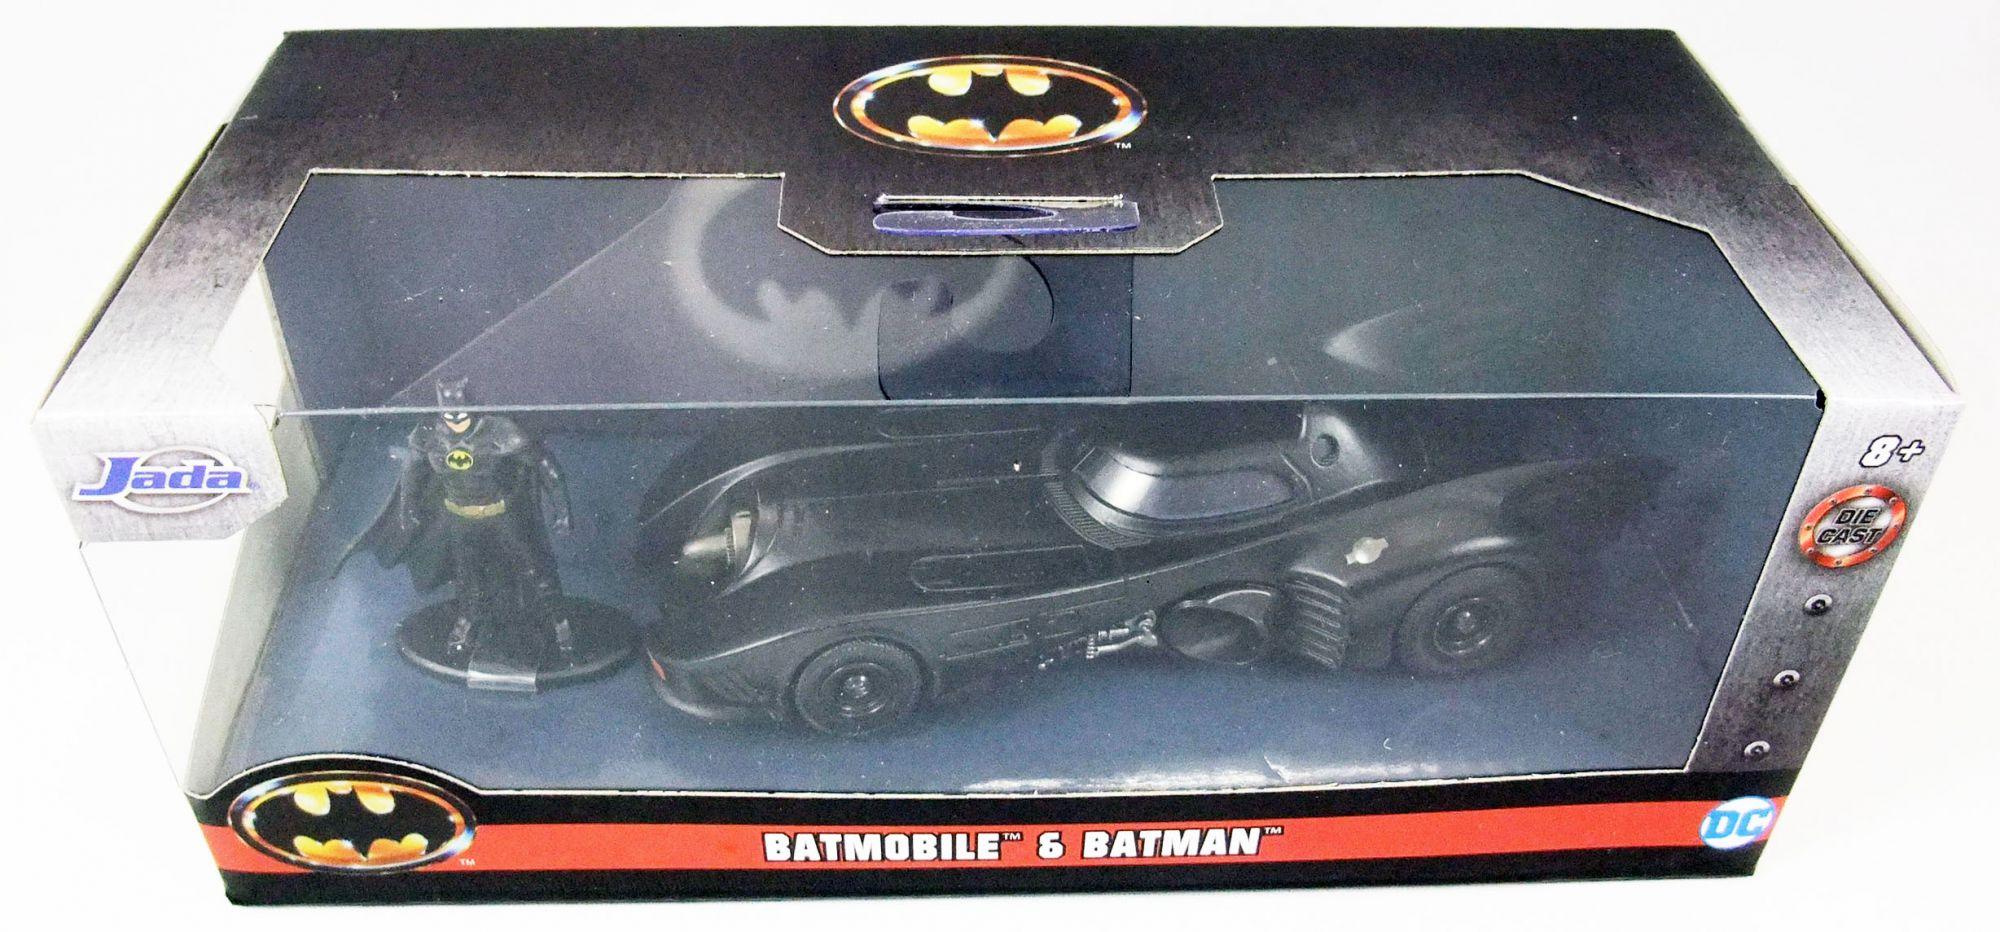 Batman le Film (1989) - Jada - Batmobile metal 1:32ème avec figurine Batman